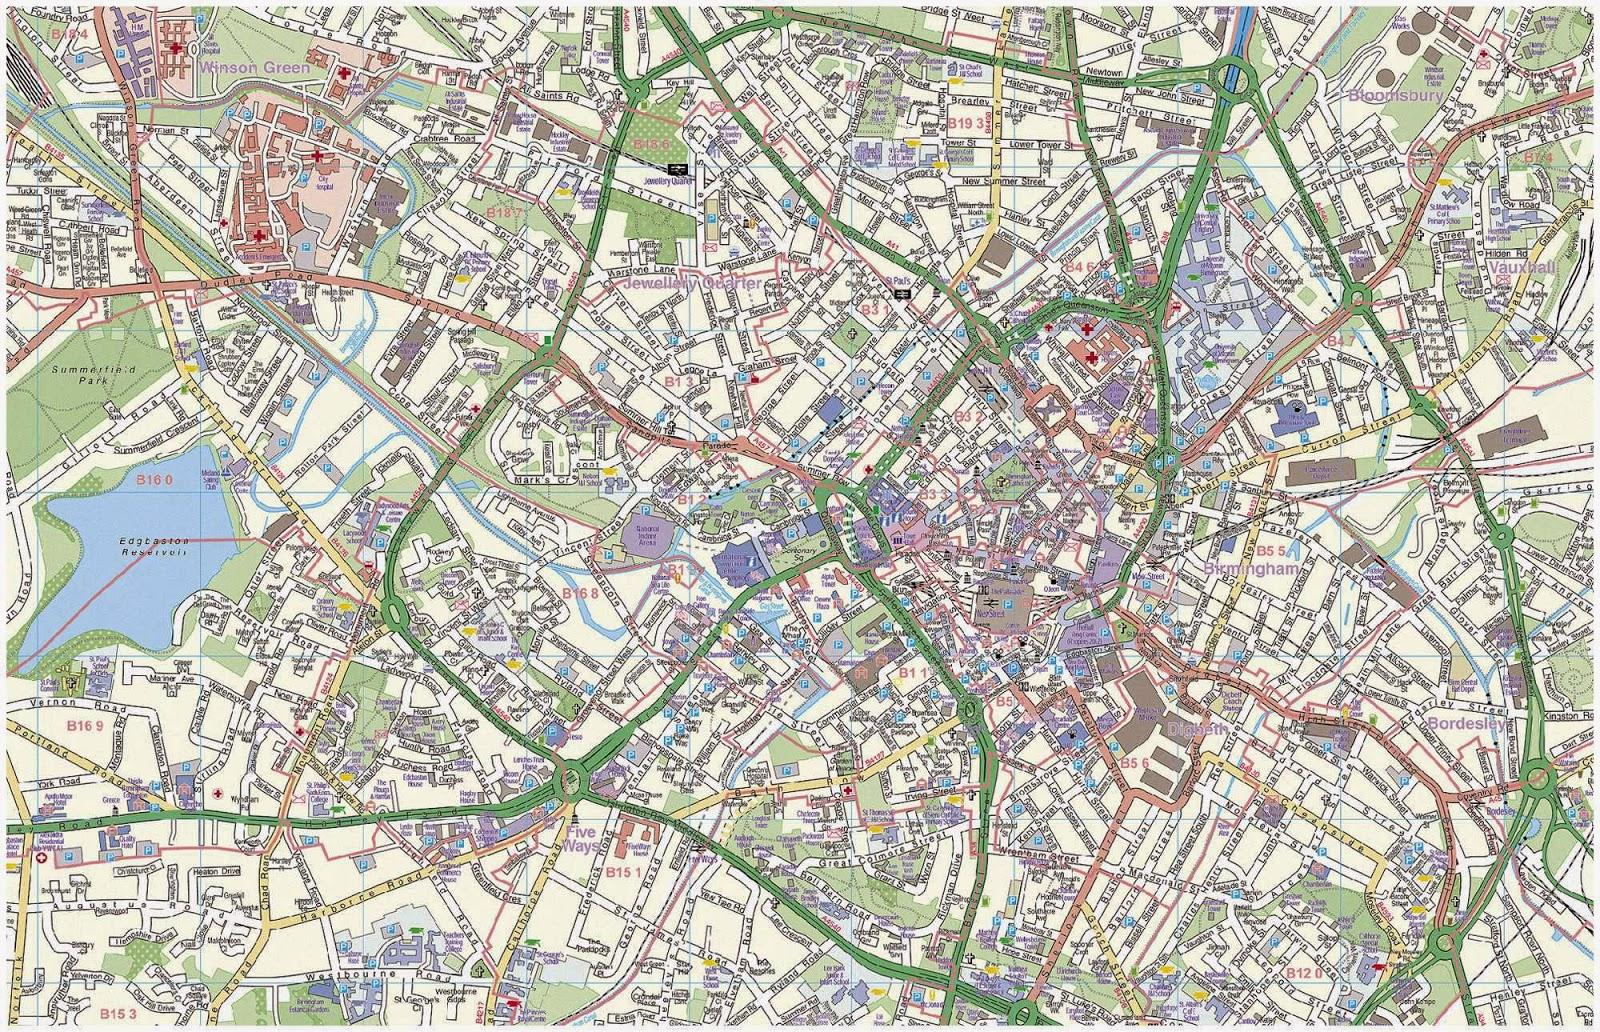 City Map of Birmingham, UK - Free Printable Maps